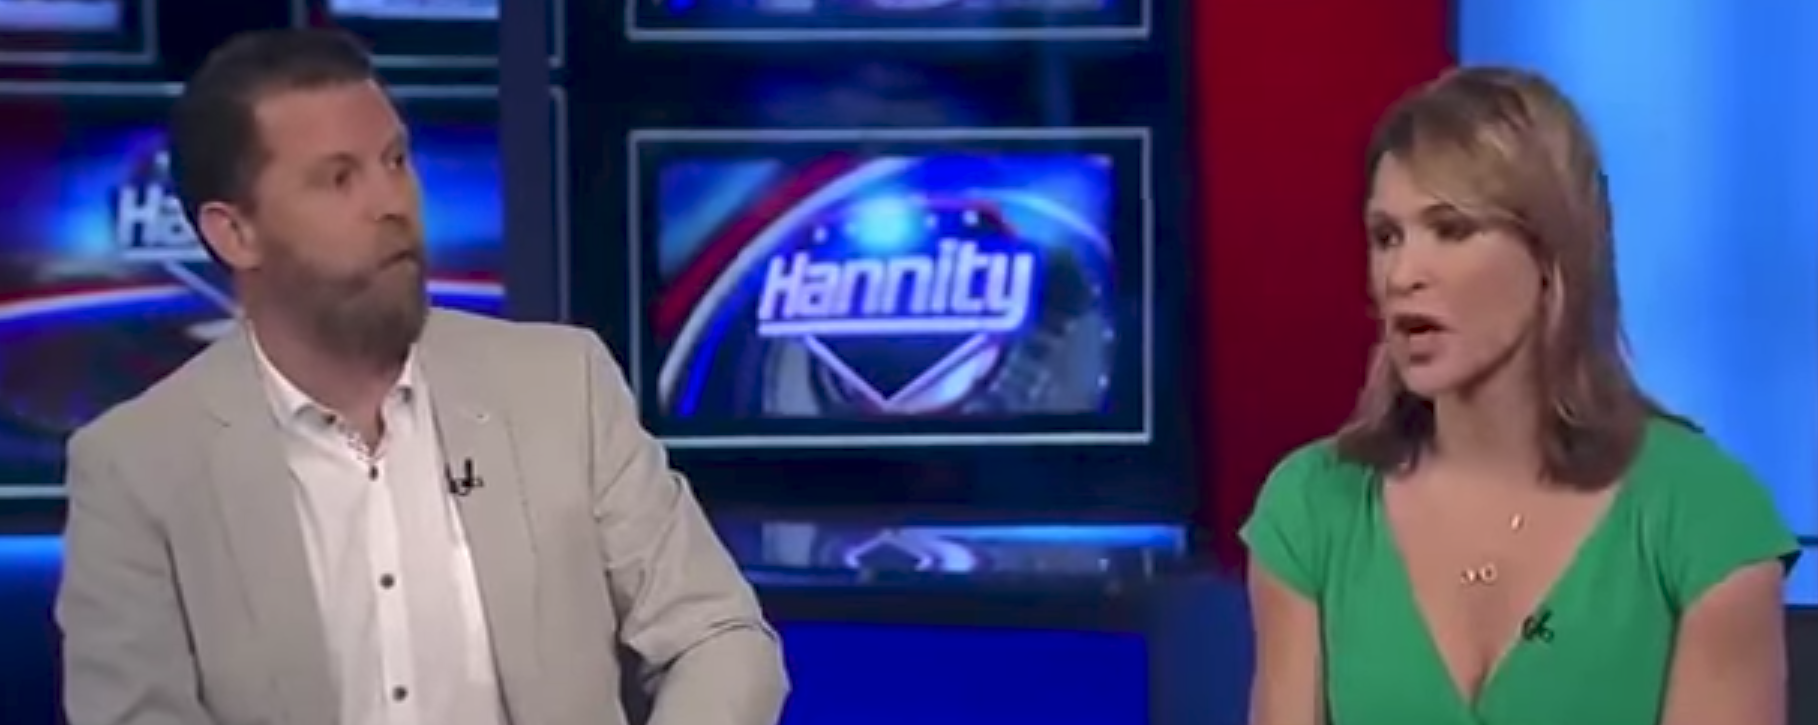 McInnes on Hannity with feminist